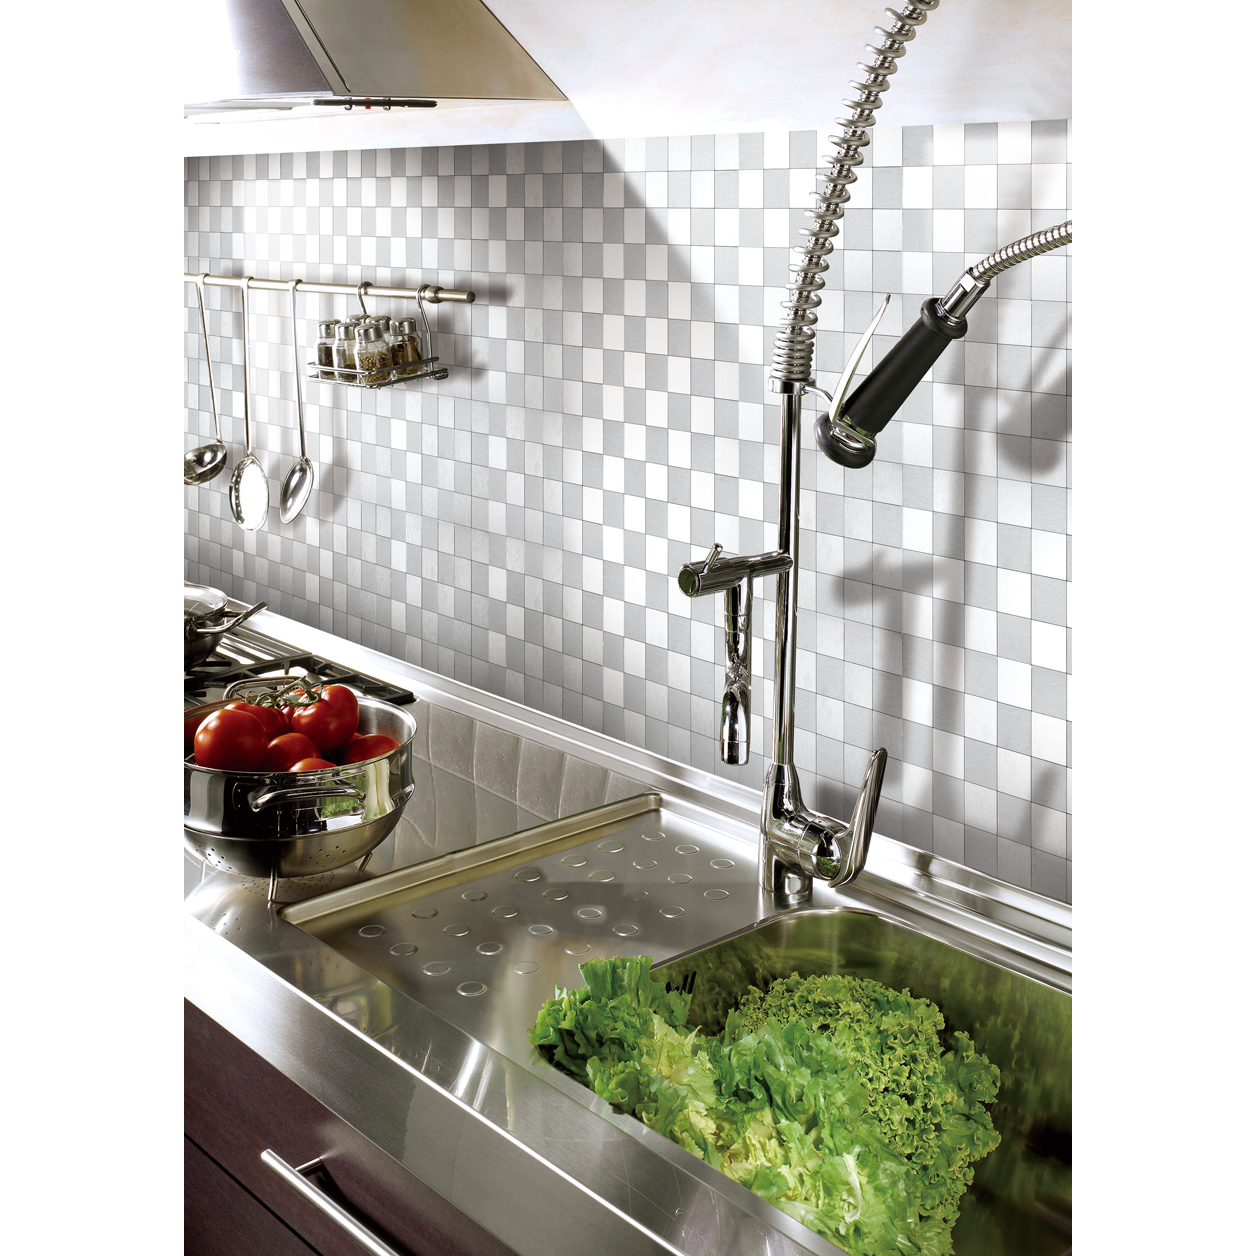 "Art3d Self-adhesive Metal Backsplash Peel and Stick Kitchen Tile, 12"" x 12"" Silver"